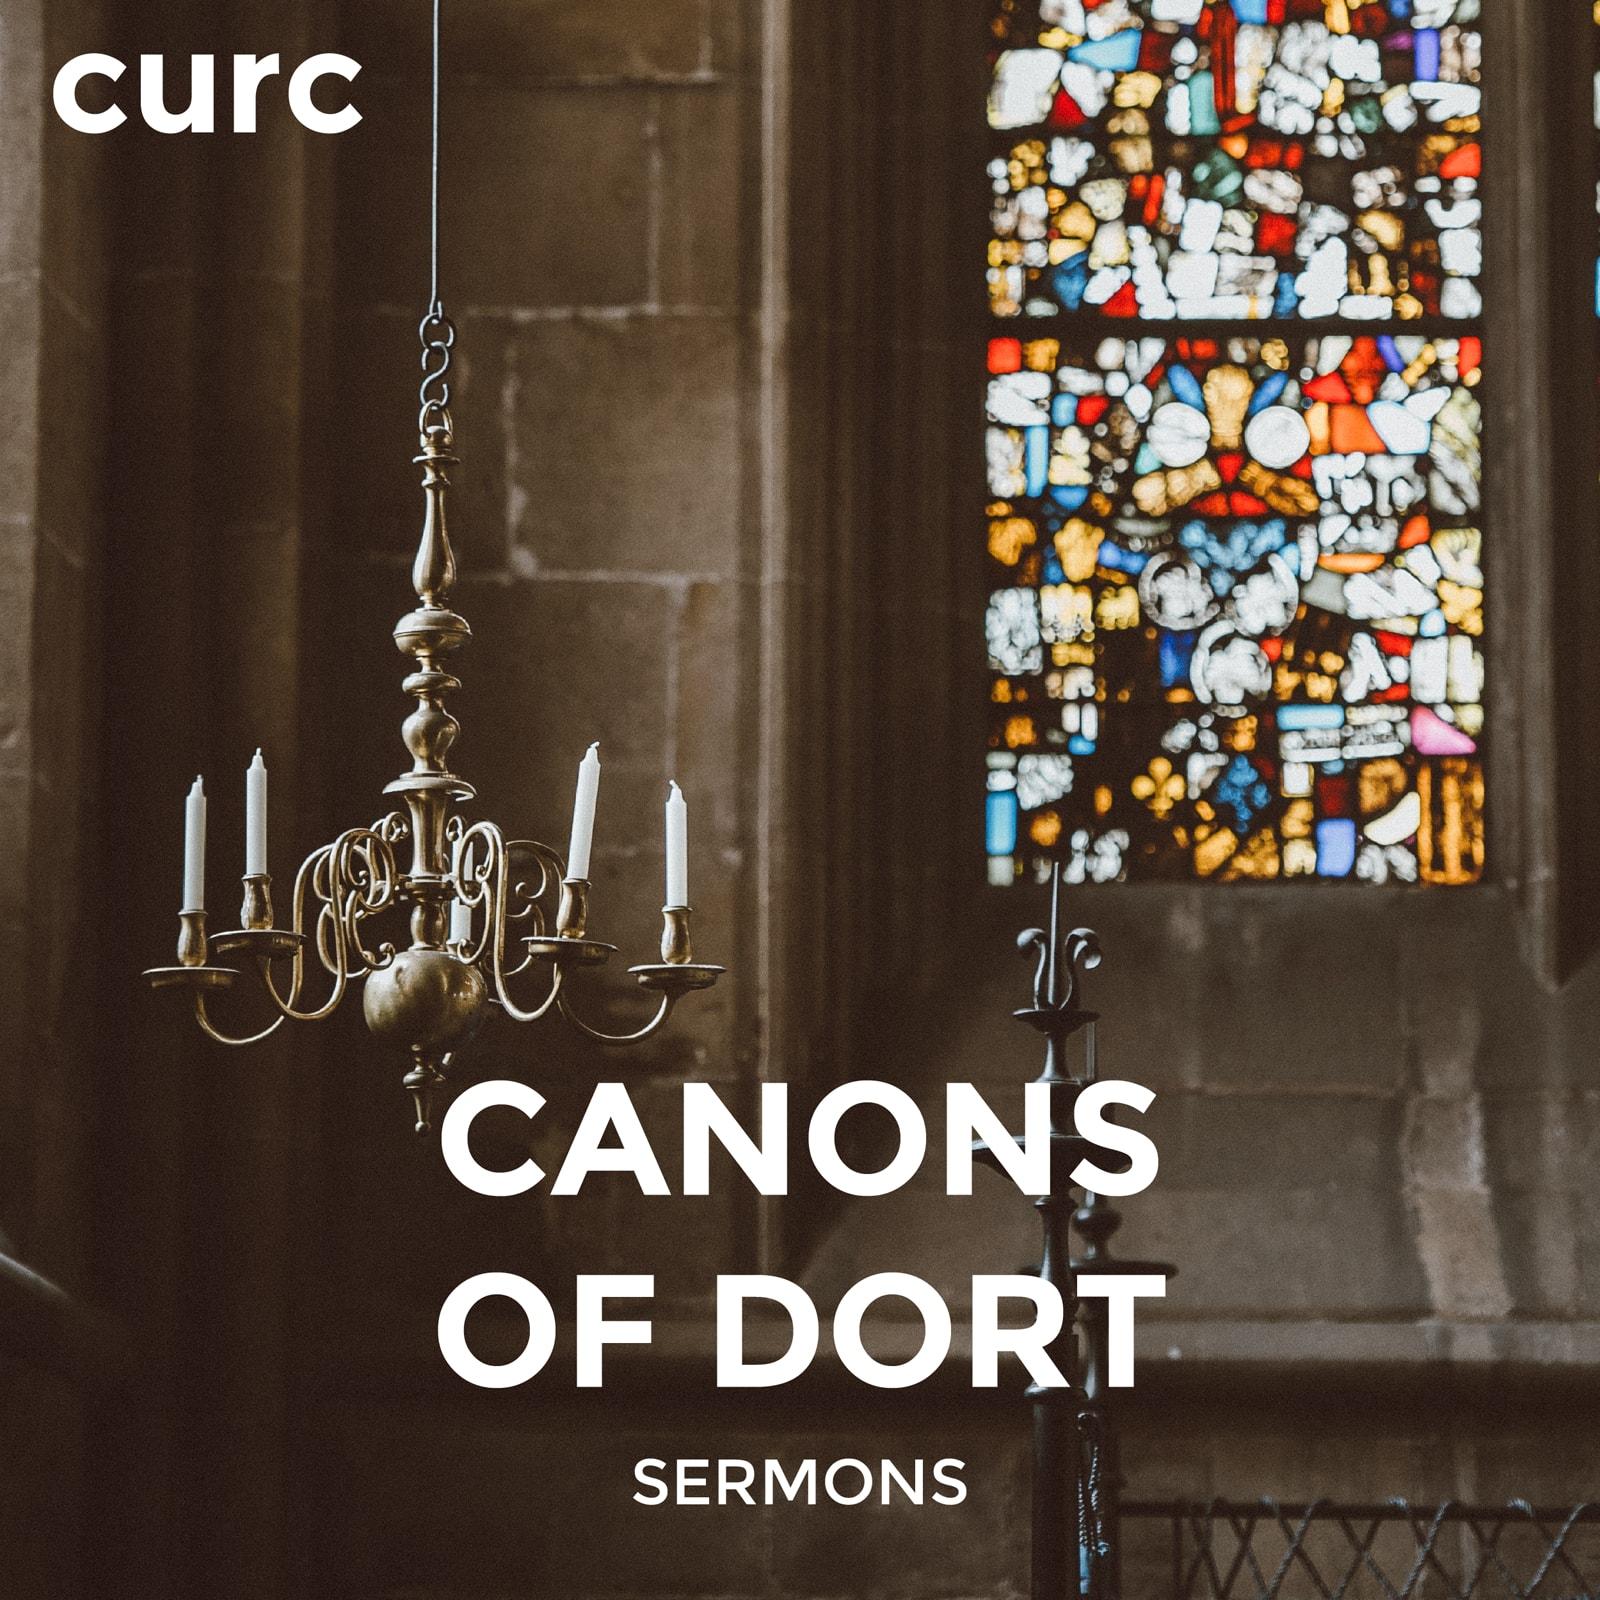 Canons of Dort Sermons – Covenant United Reformed Church